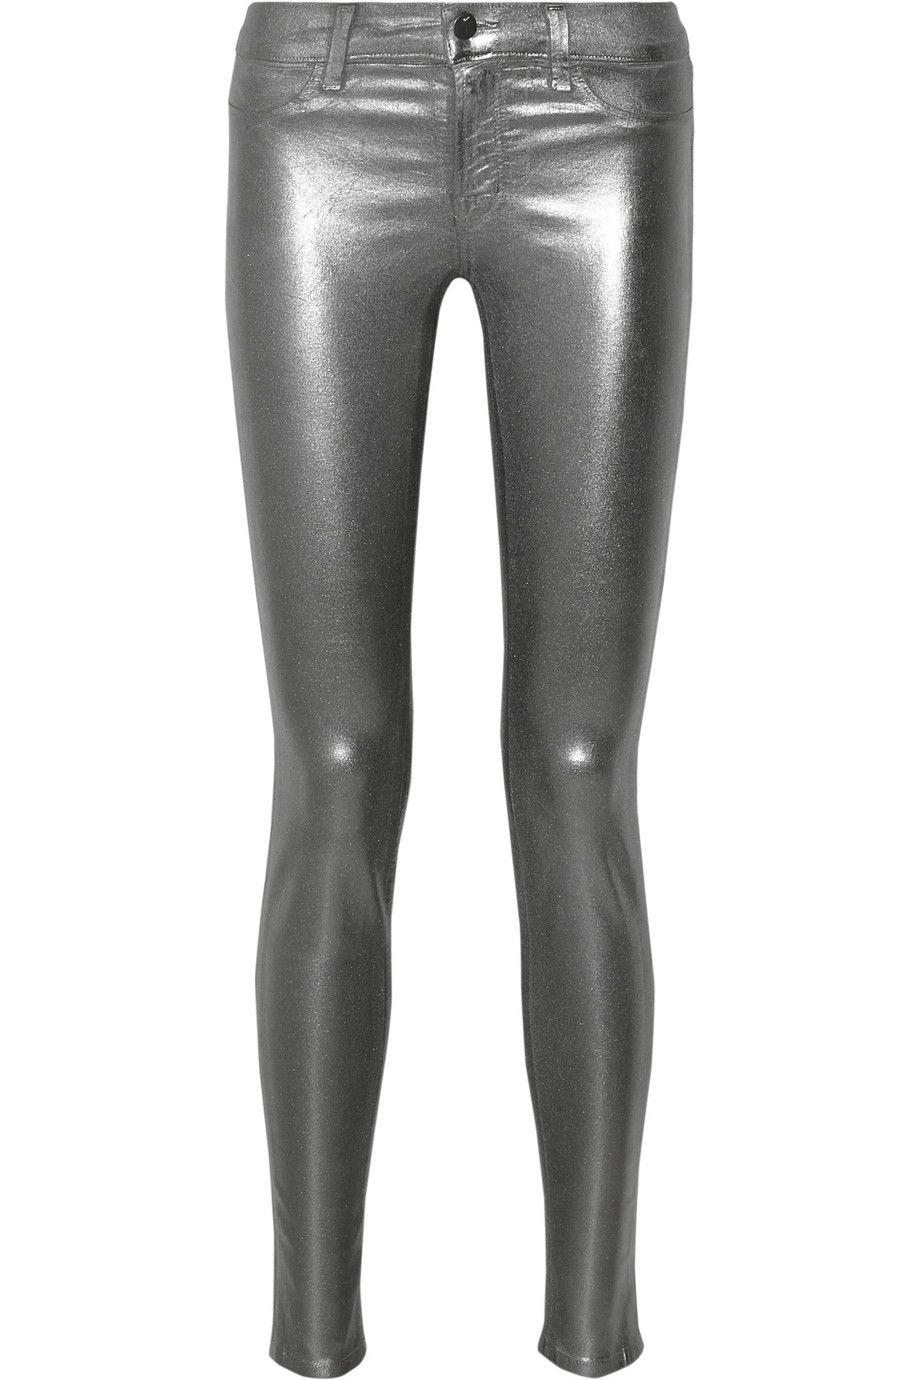 J Brand|815 coated mid-rise skinny jeans|NET-A-PORTER.COM